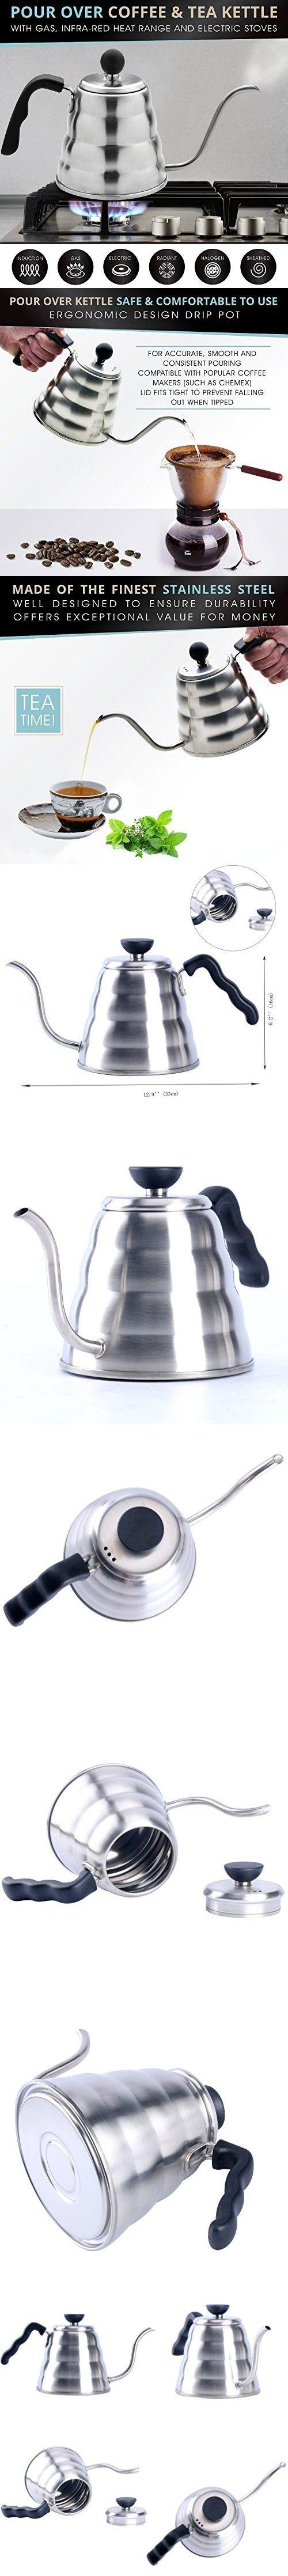 YaeKoo 1L Stainless Steel 304 Coffee Drip Kettle,Gooseneck Stainless Steel Drip Pot for Coffee & Tea